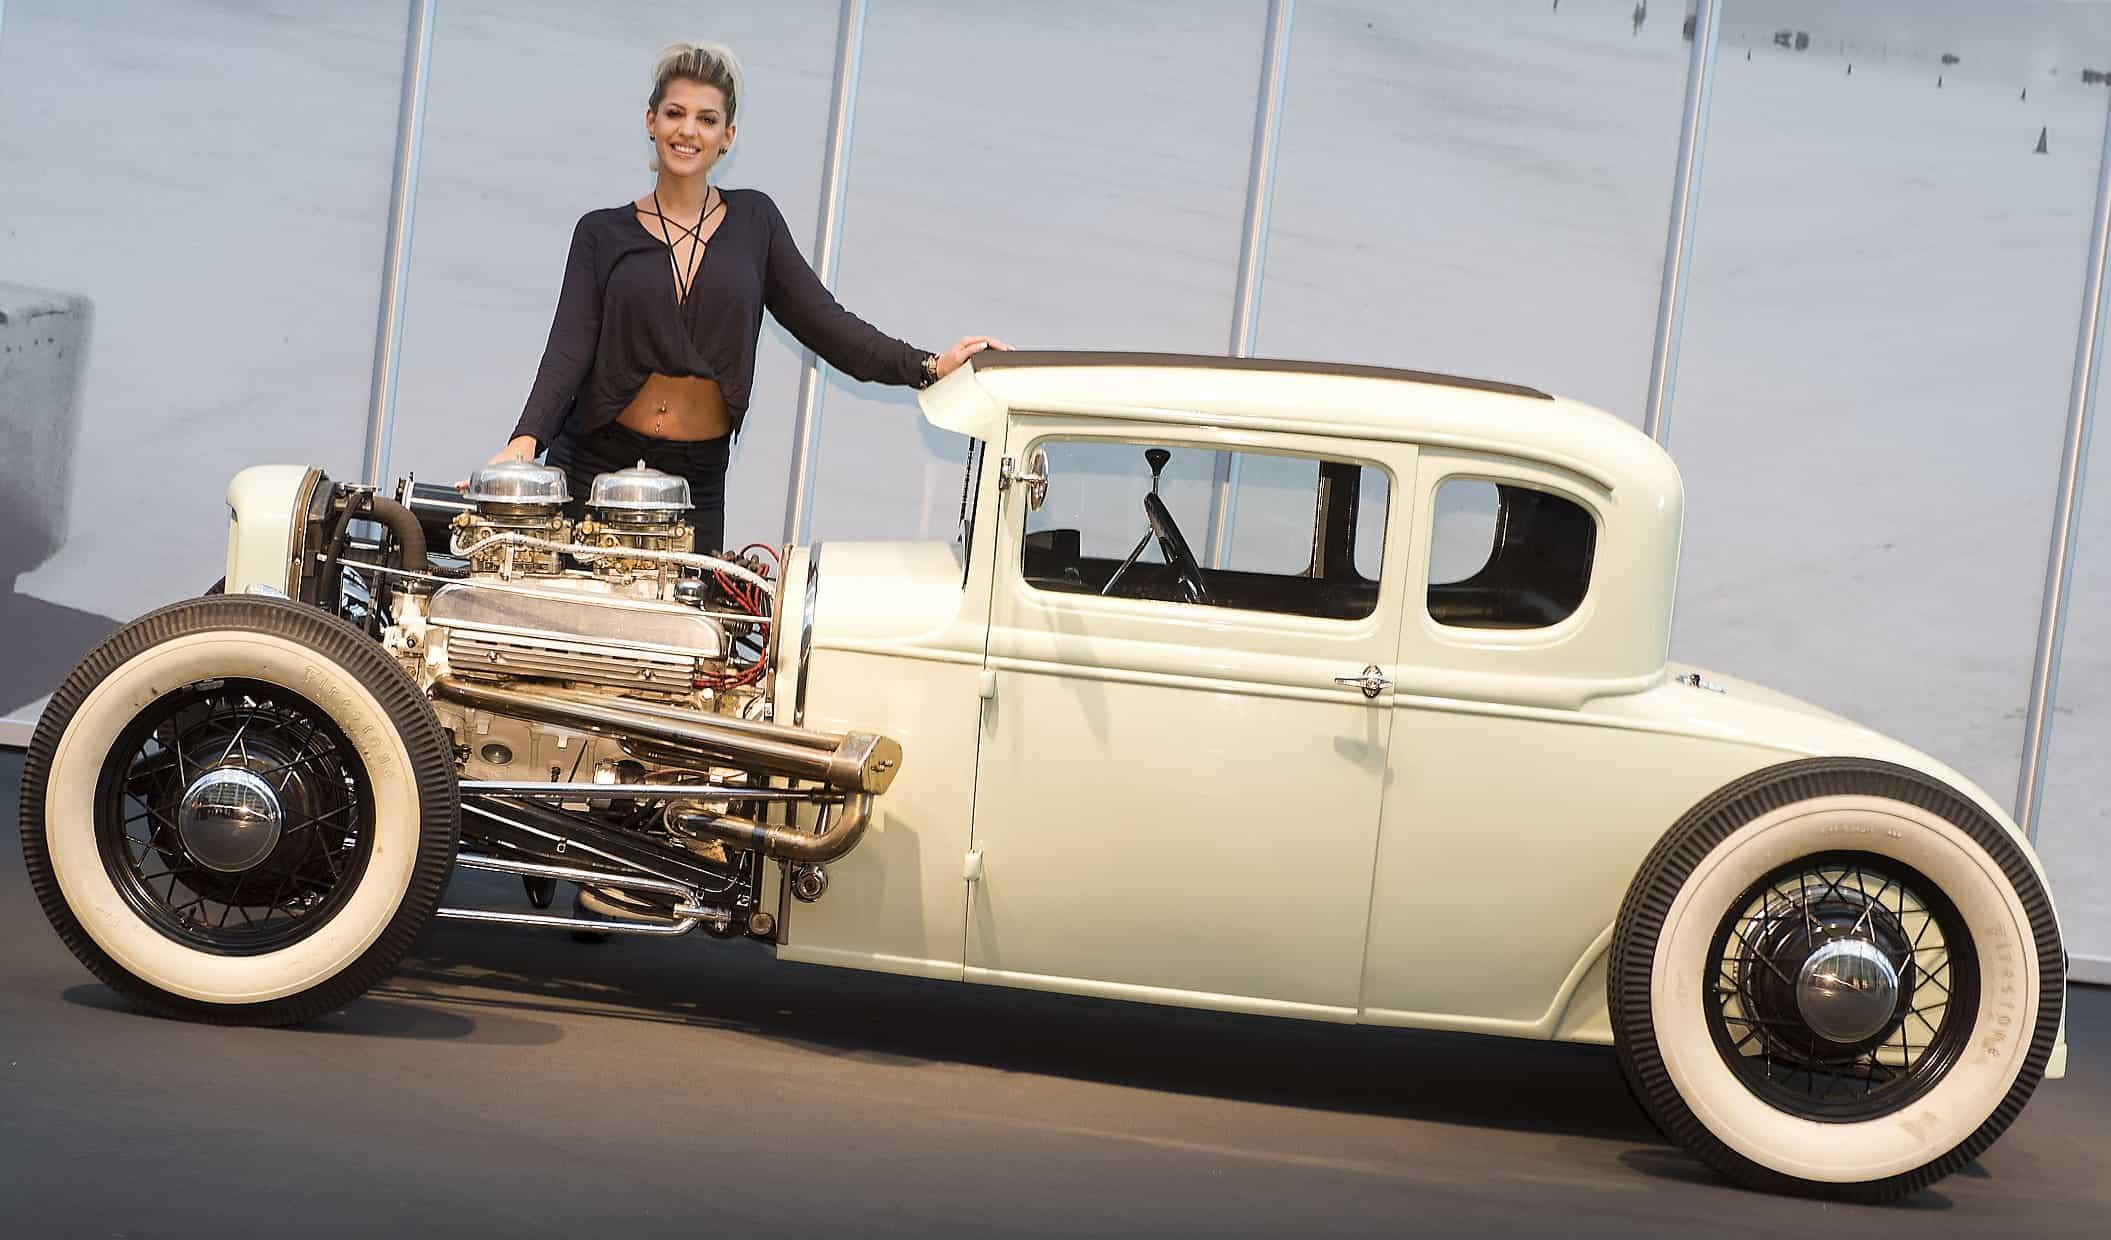 Hot Rod Ford A-Modell aus dem Jahr 1931 mit Playmate Sarah Nowak